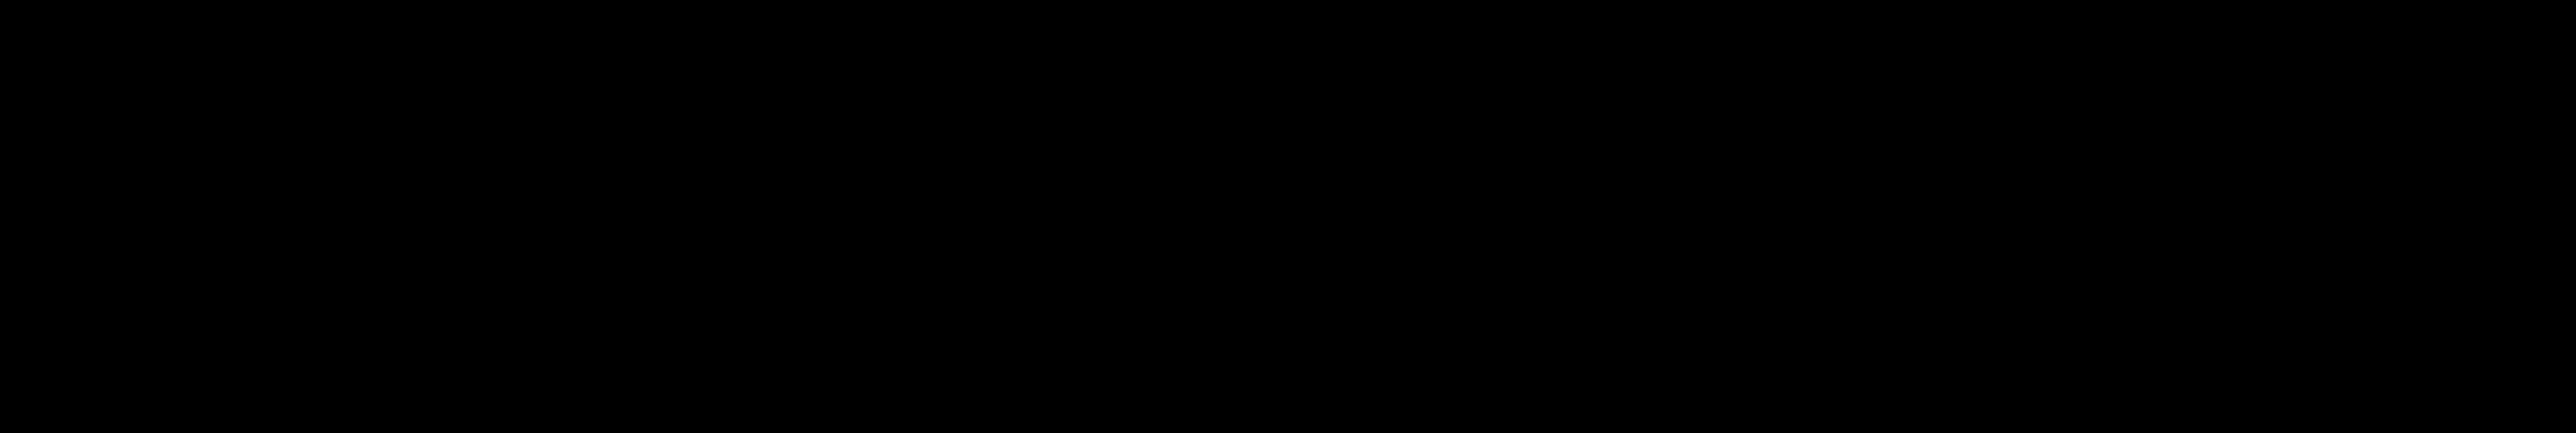 Logstrup